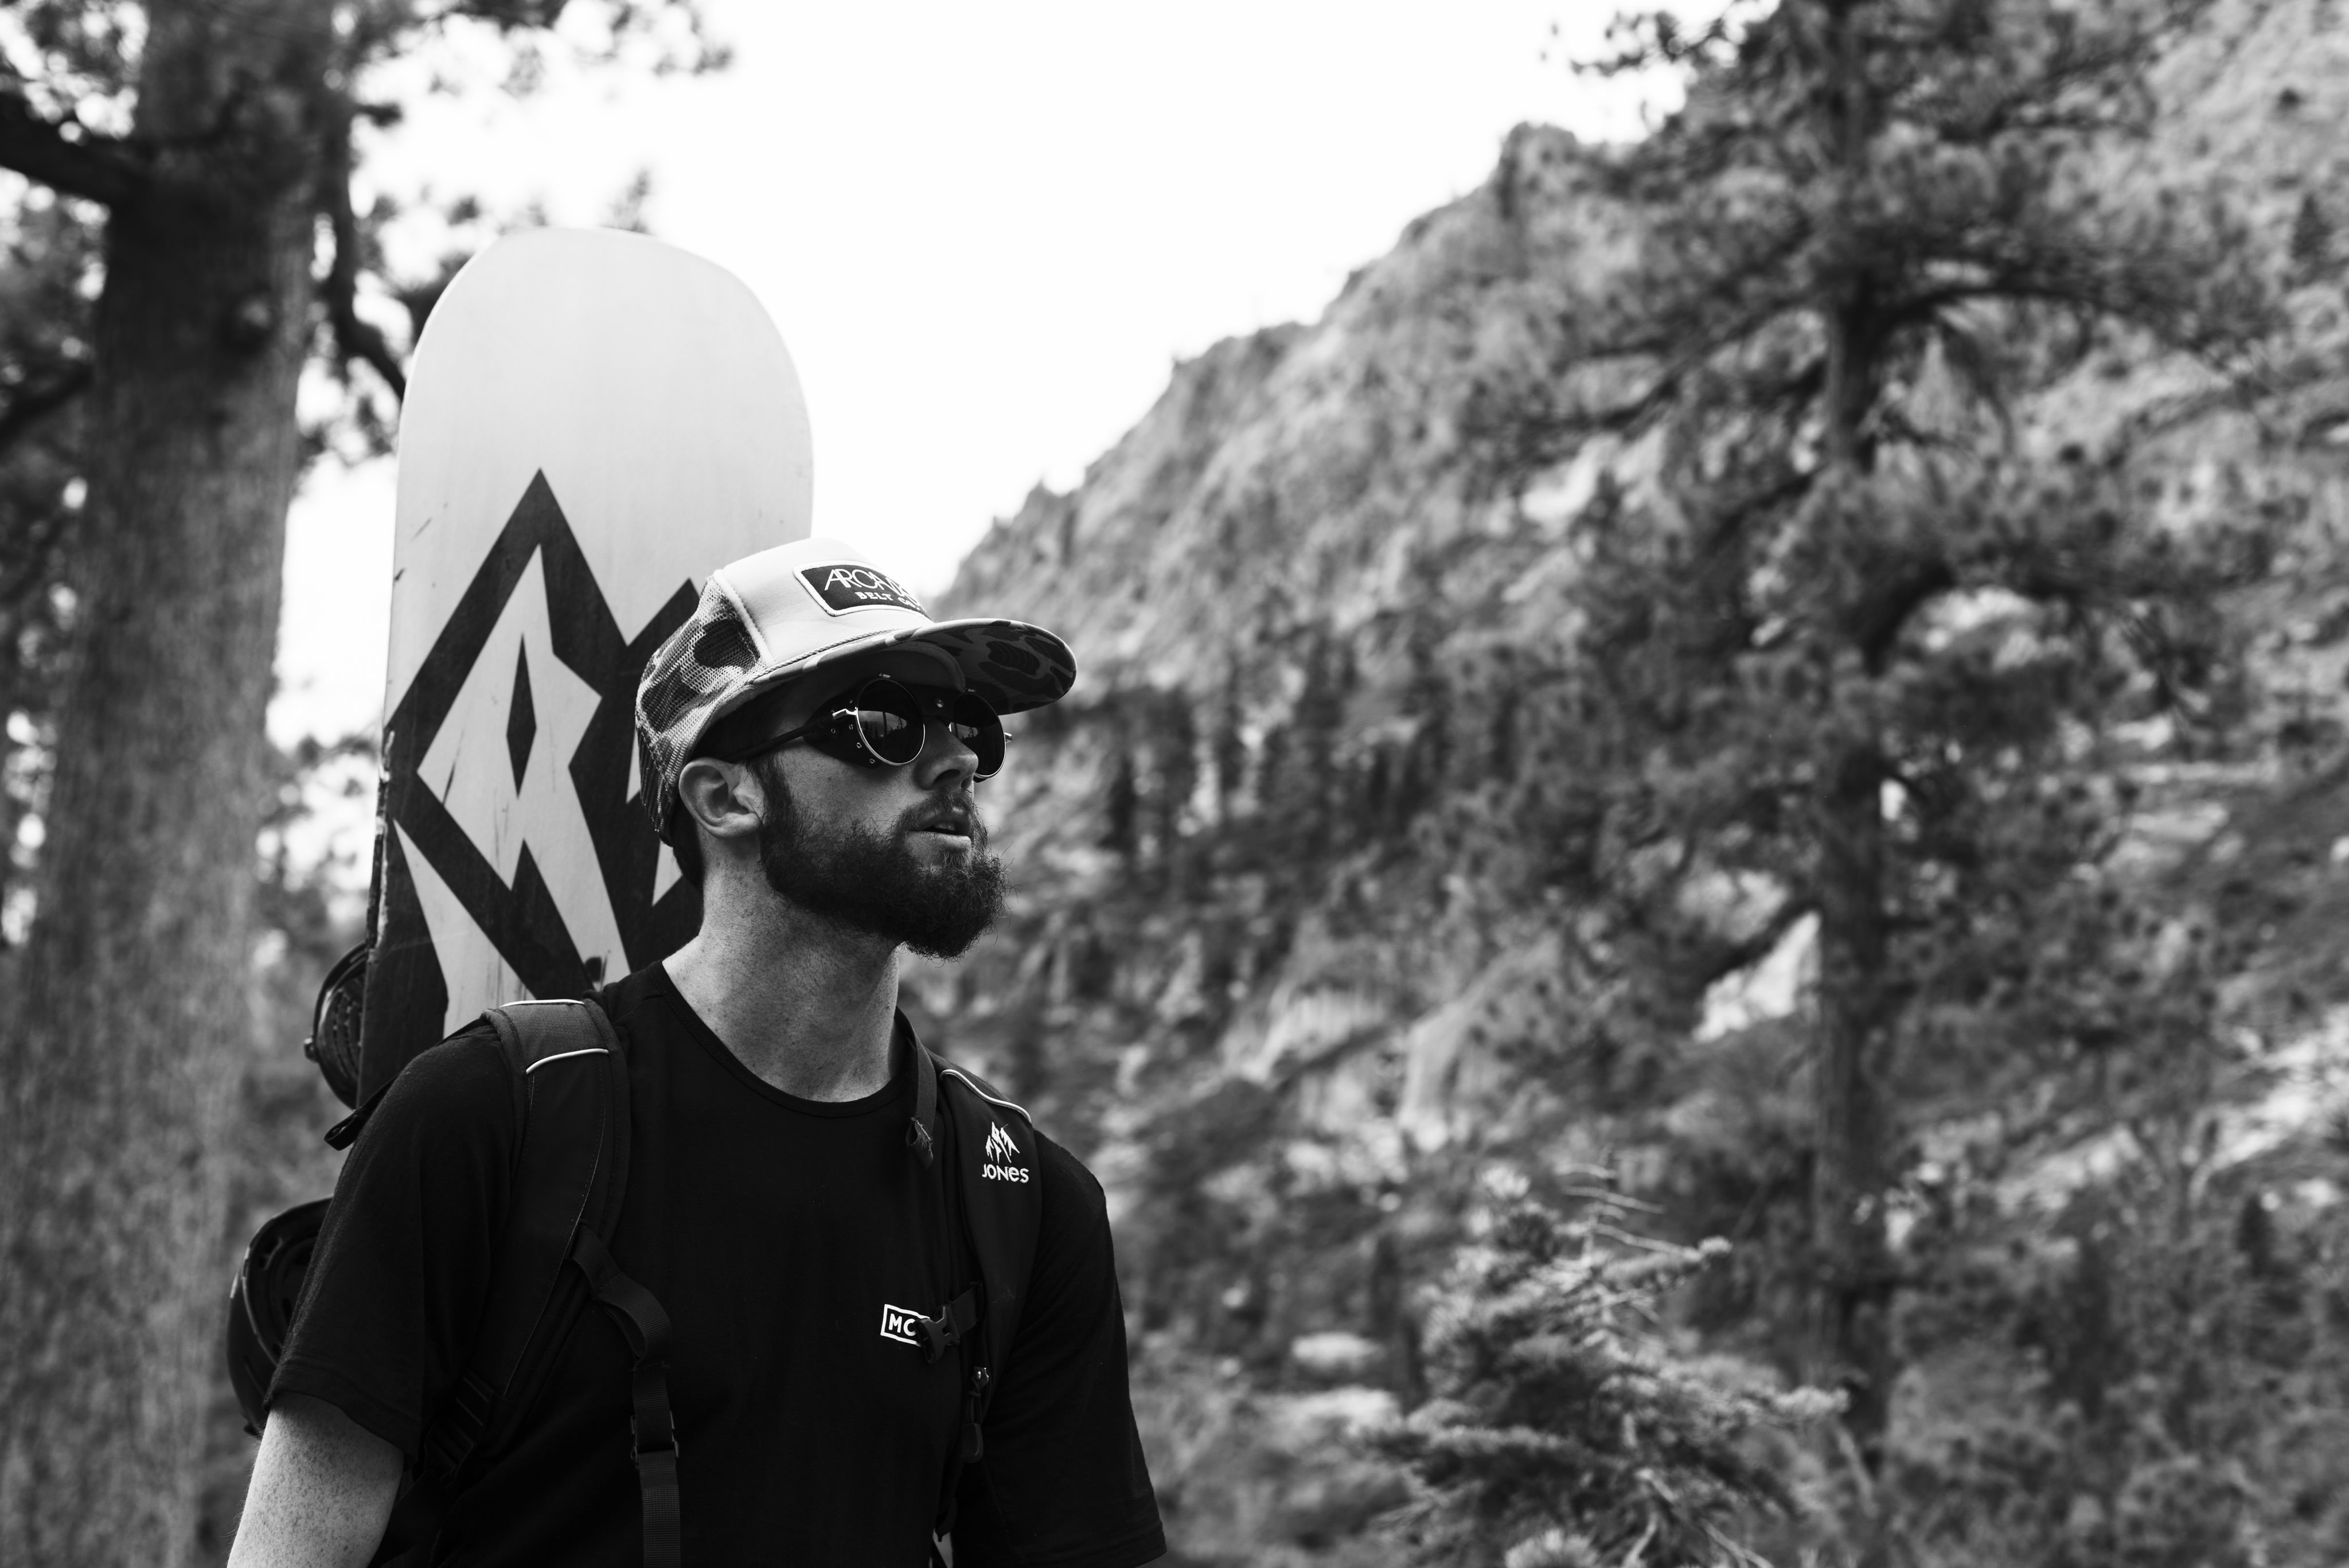 Garrett cygan snowboarder profile